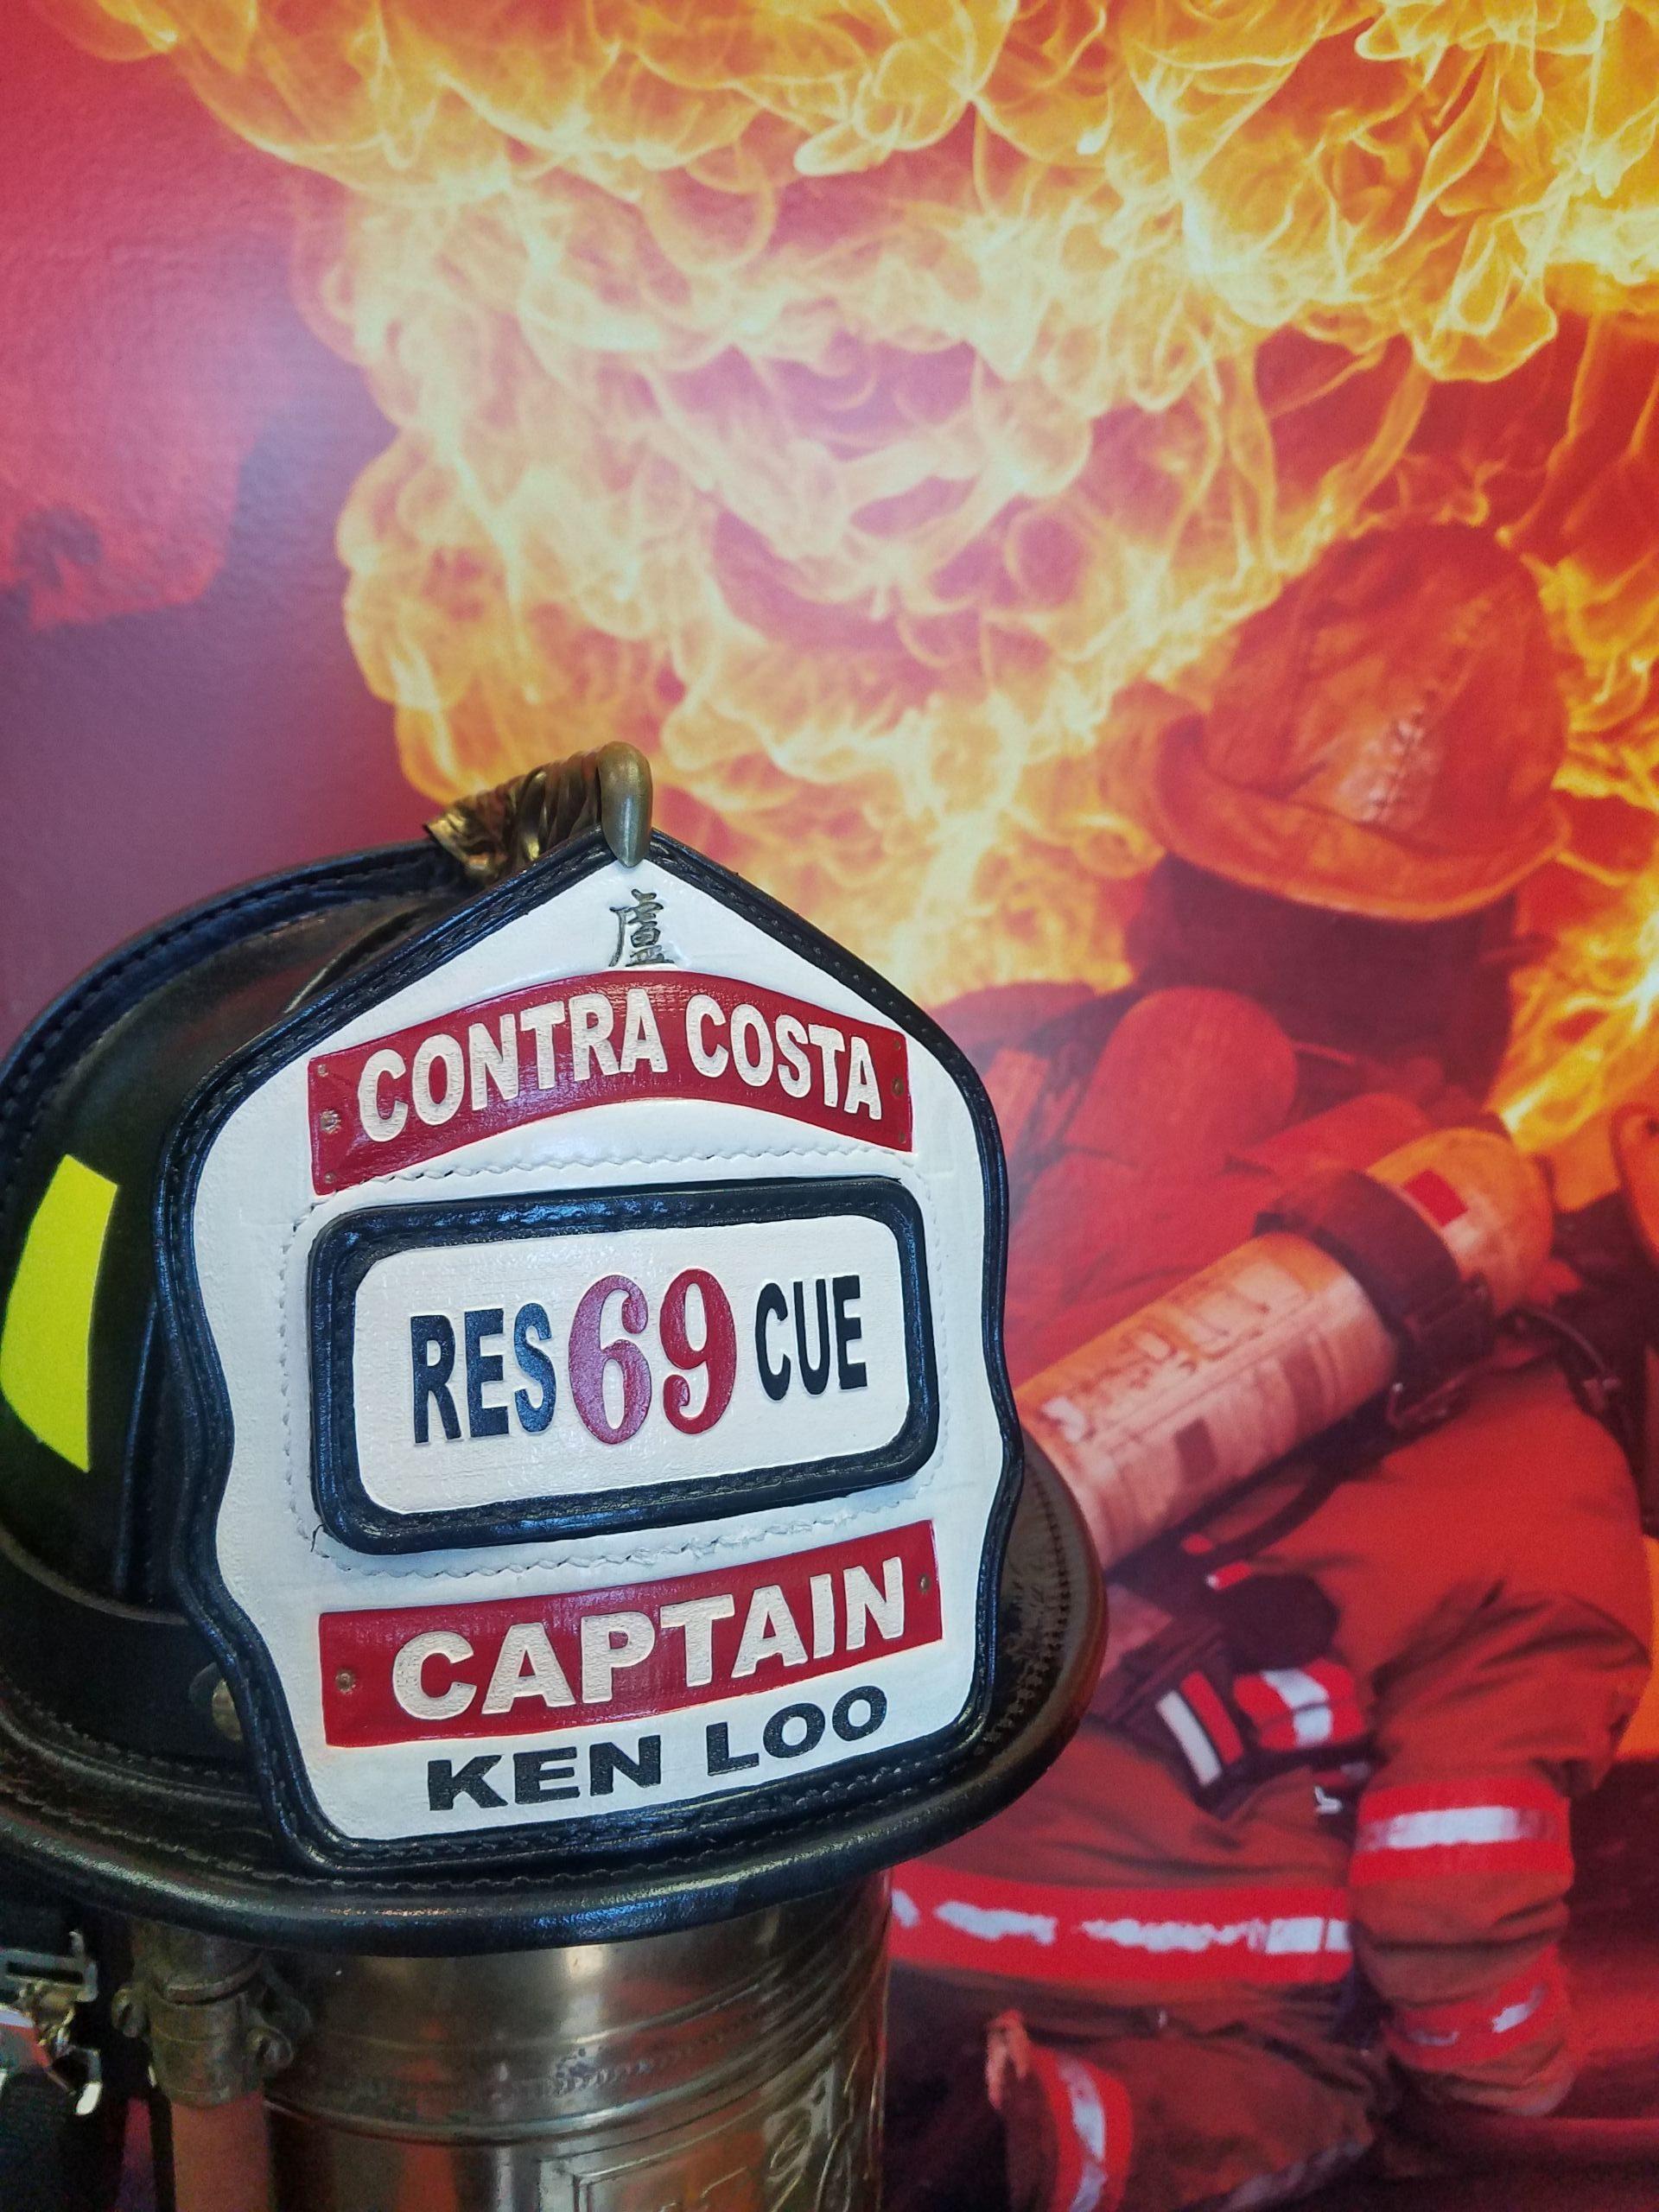 firefighter shields, helmet fronts